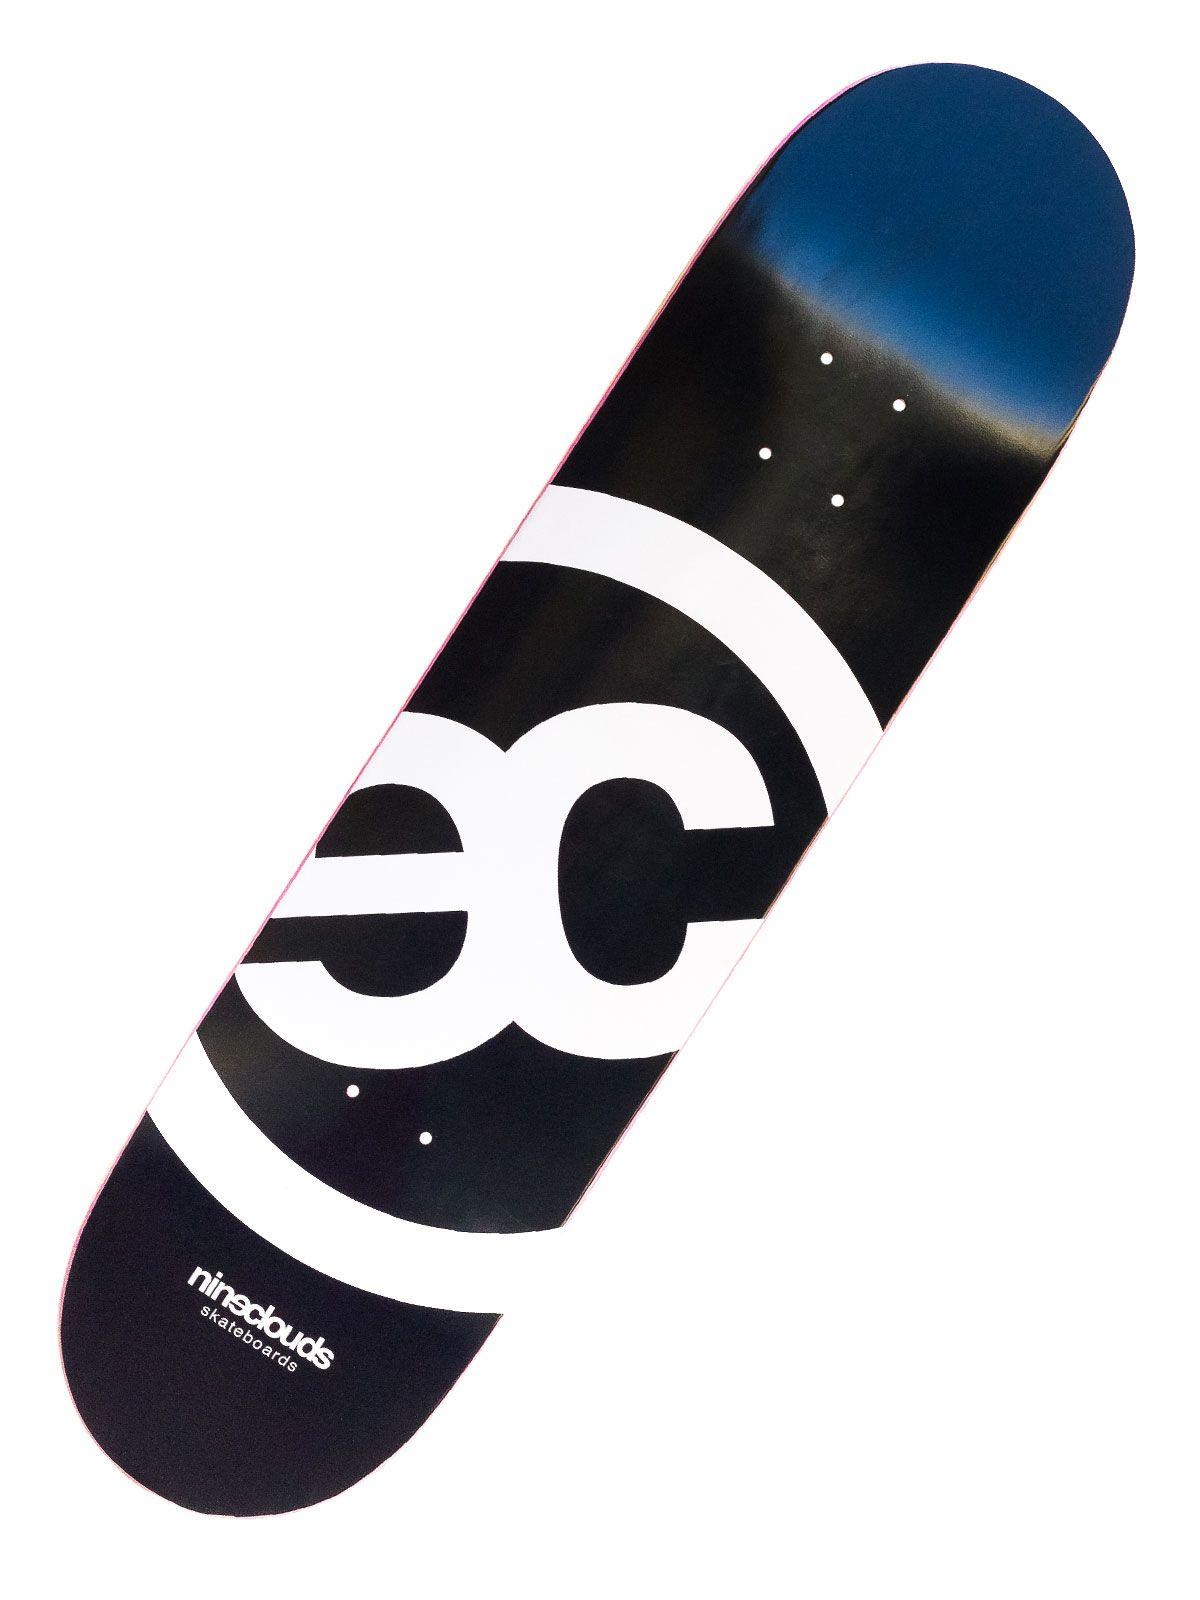 shape-nineclouds-logo-moeda-preto-8125-1-image